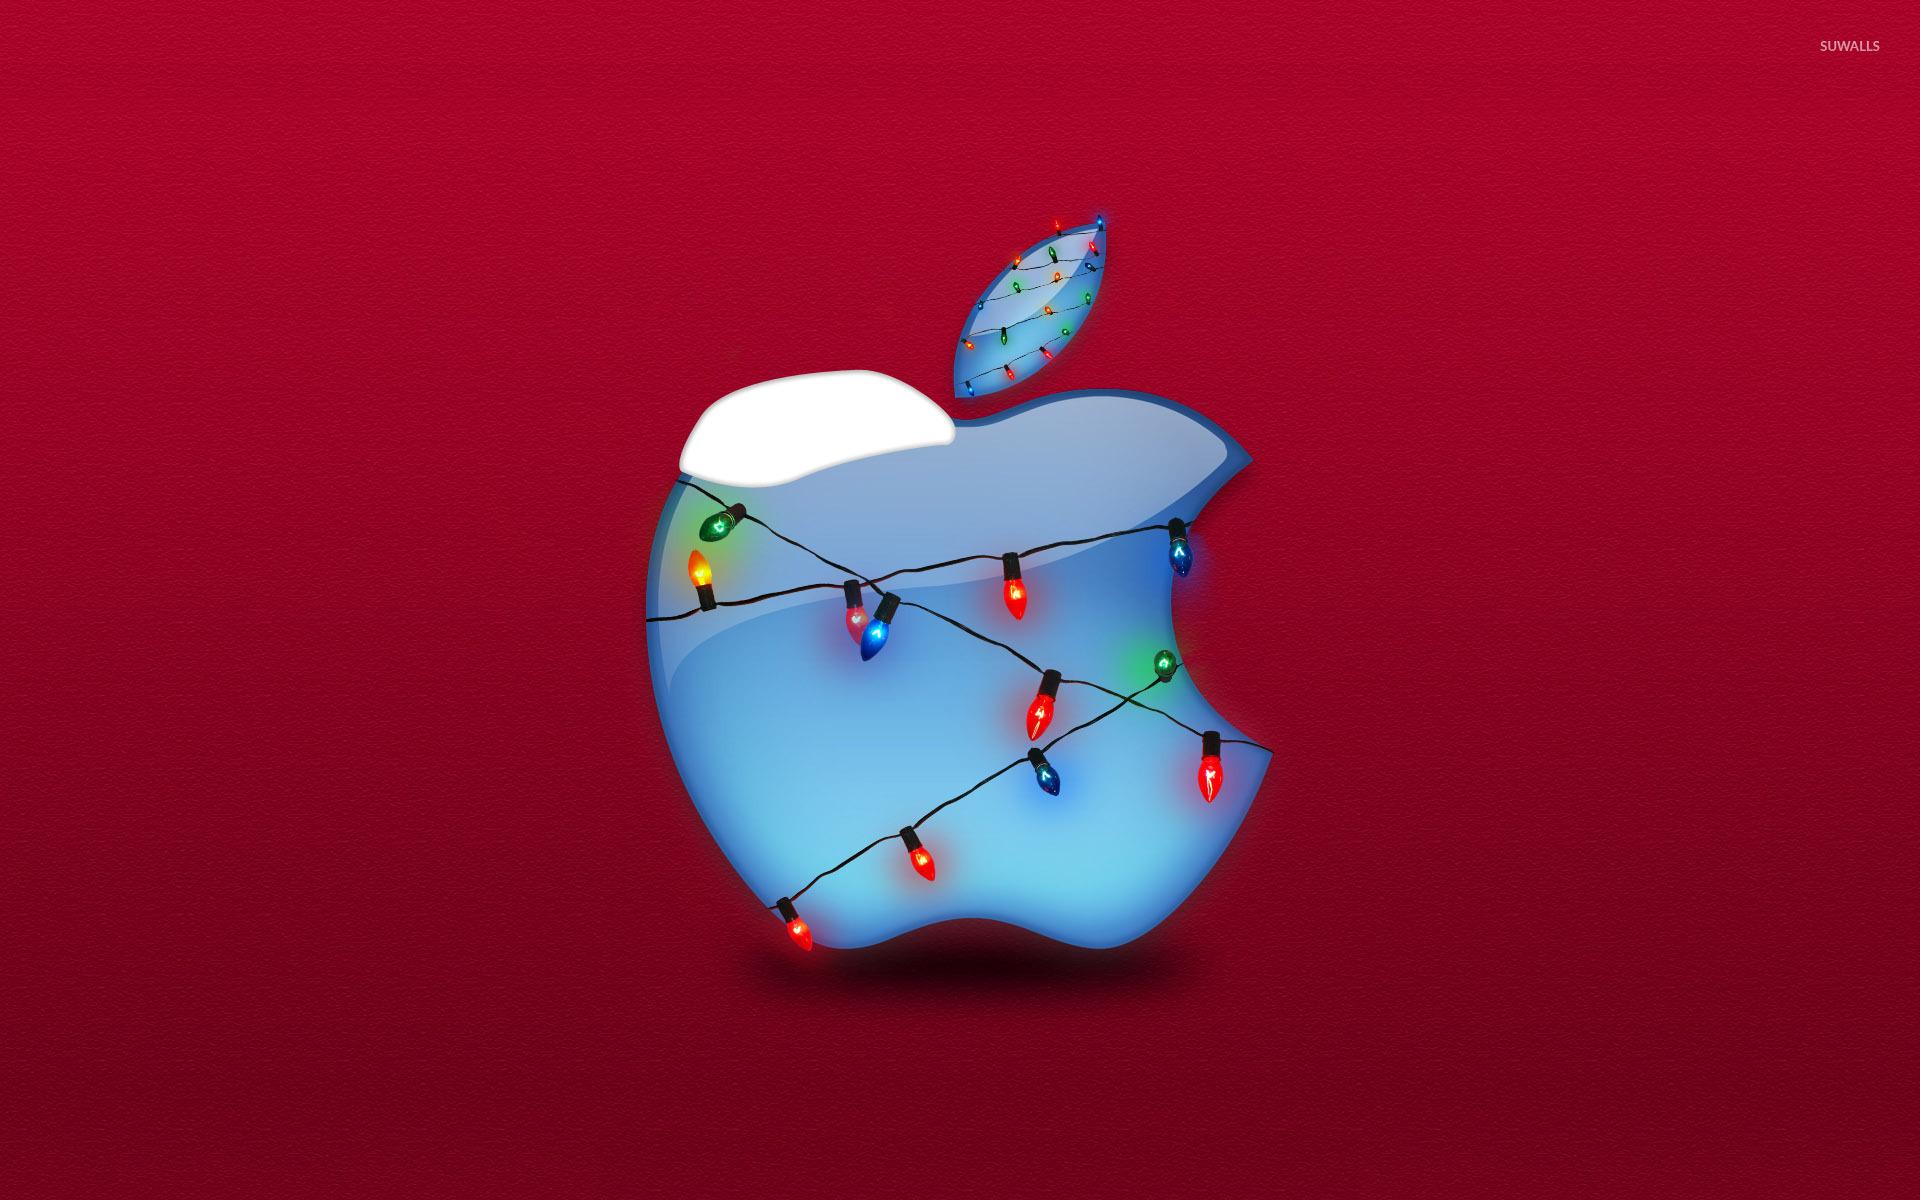 Christmas lights Apple wallpaper   Computer wallpapers   34716 1920x1200